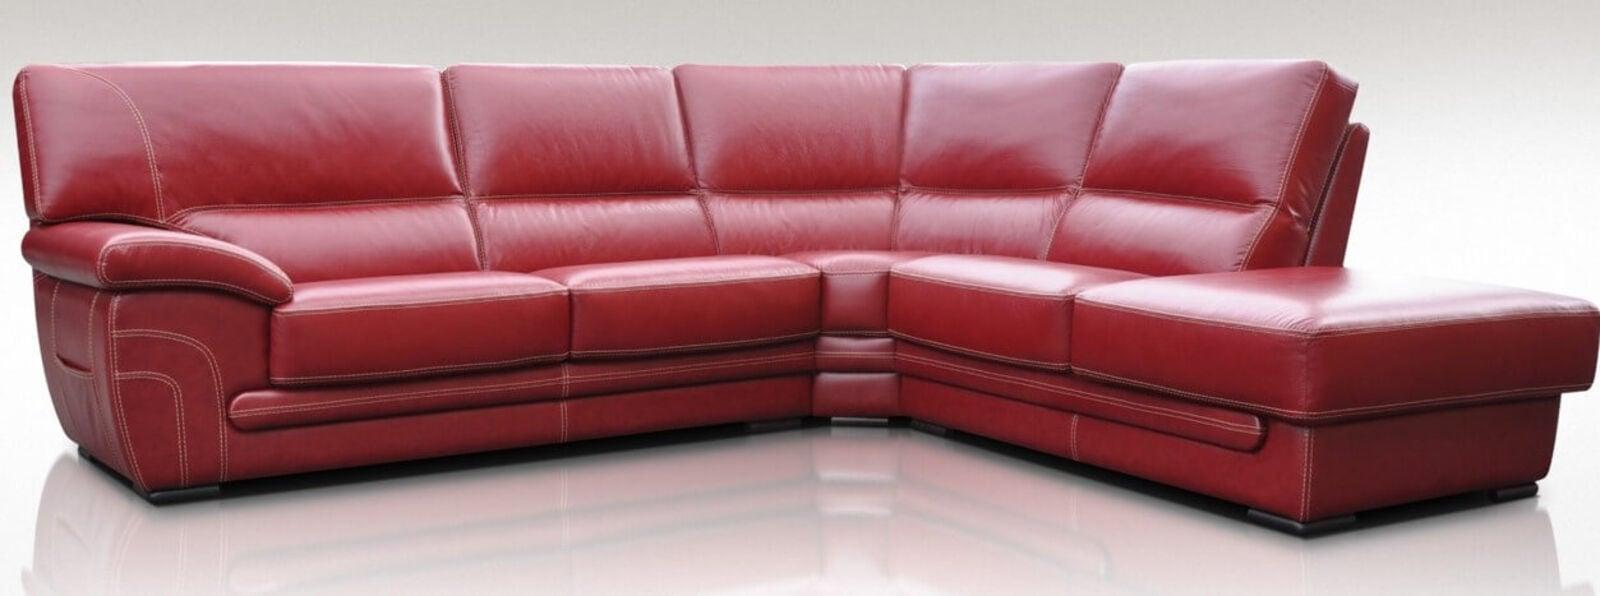 Naples 3 + Corner + 1 Genuine Italian Red Leather Corner Sofa Group Suite  Offer